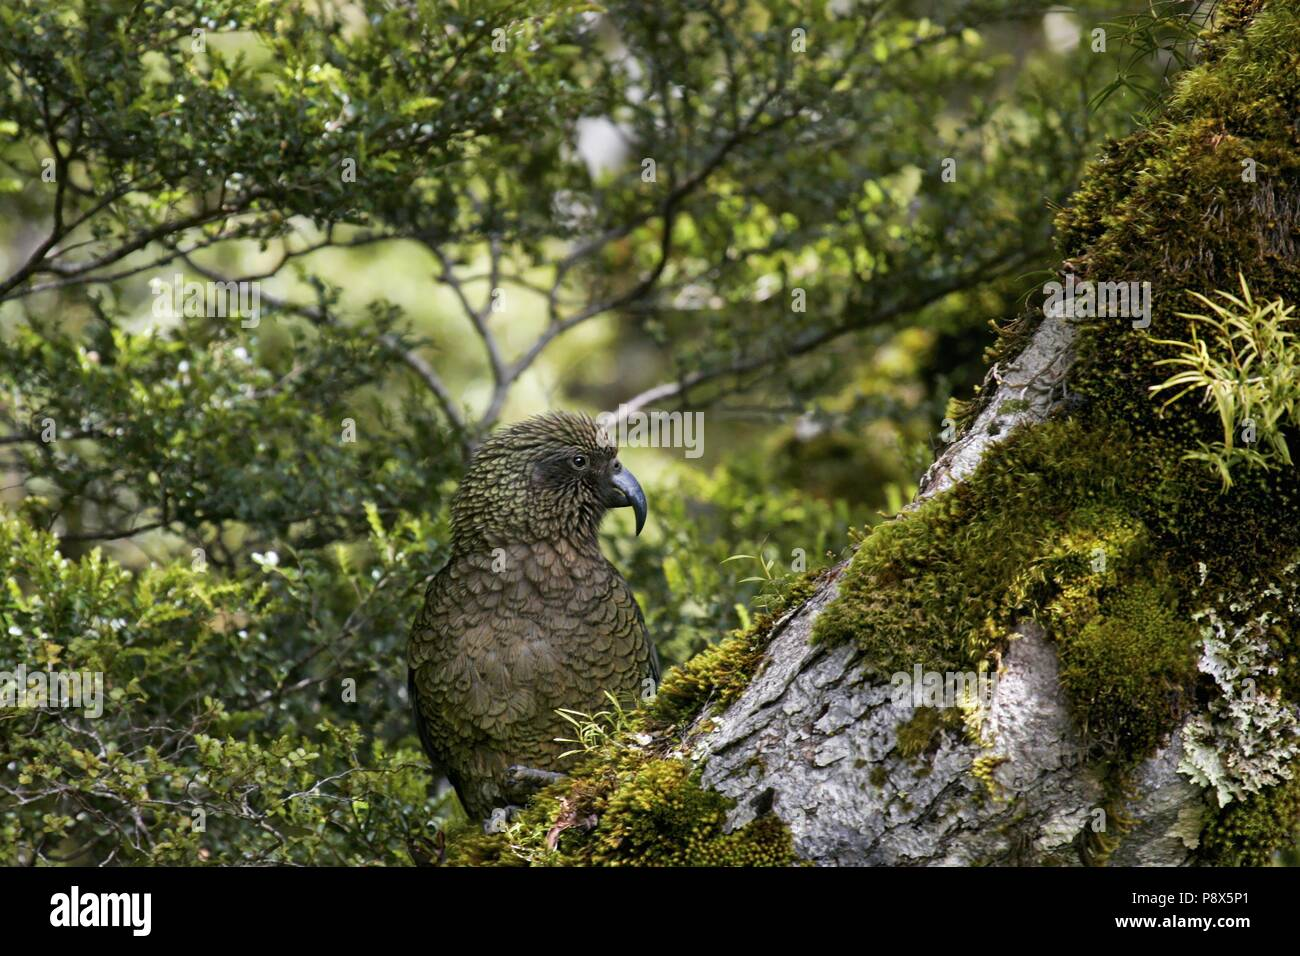 Kea (Nestor notabilis) sitting on mossy tree trunk, Arthur's Pass National Park, New Zealand   usage worldwide Stock Photo